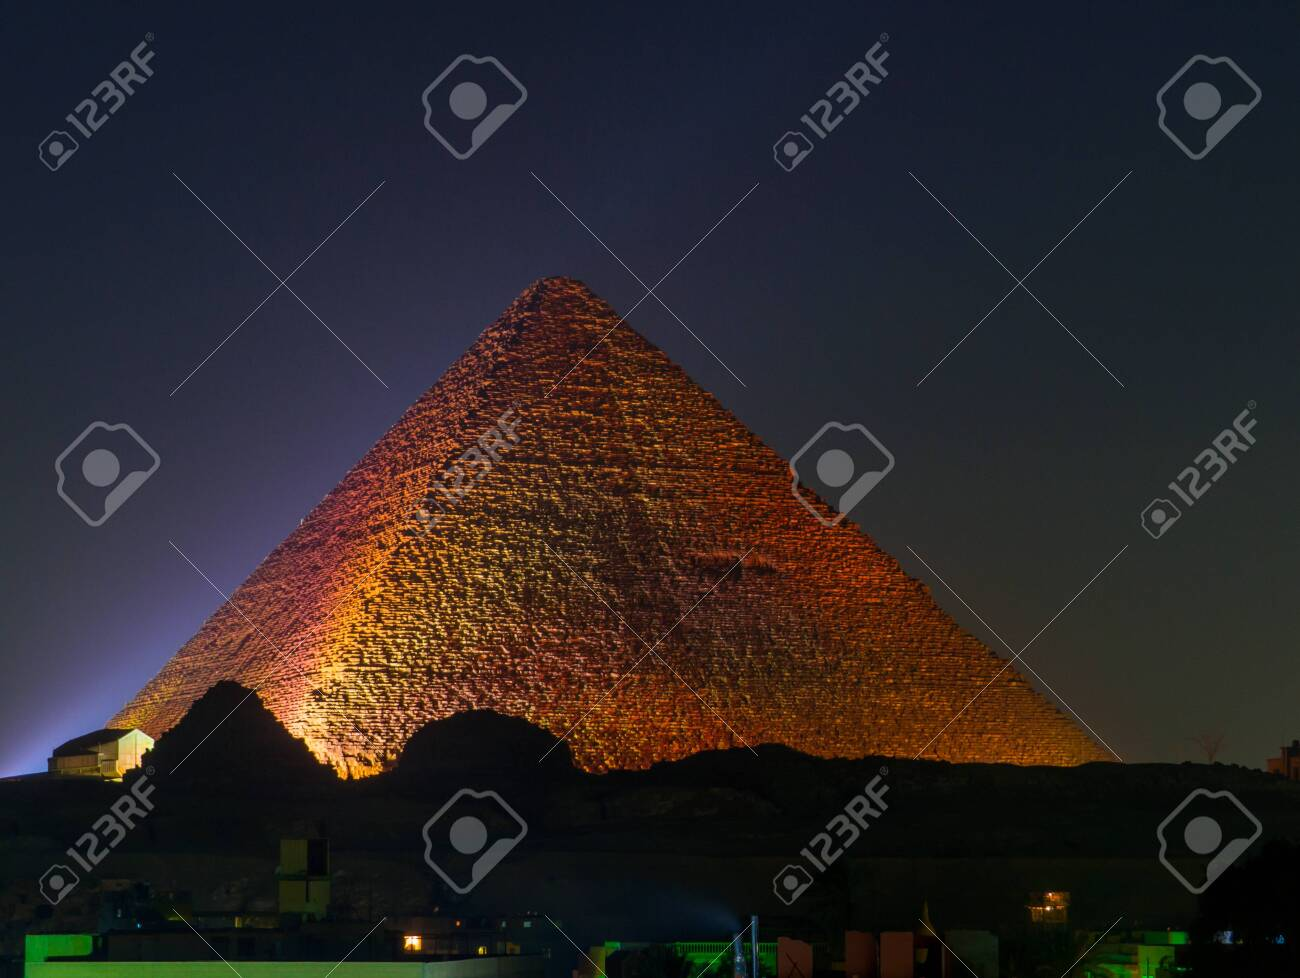 Cairo, Egypt - November 31, 2019: View of the Great Pyramid of Giza illuminated at night. - 151449162